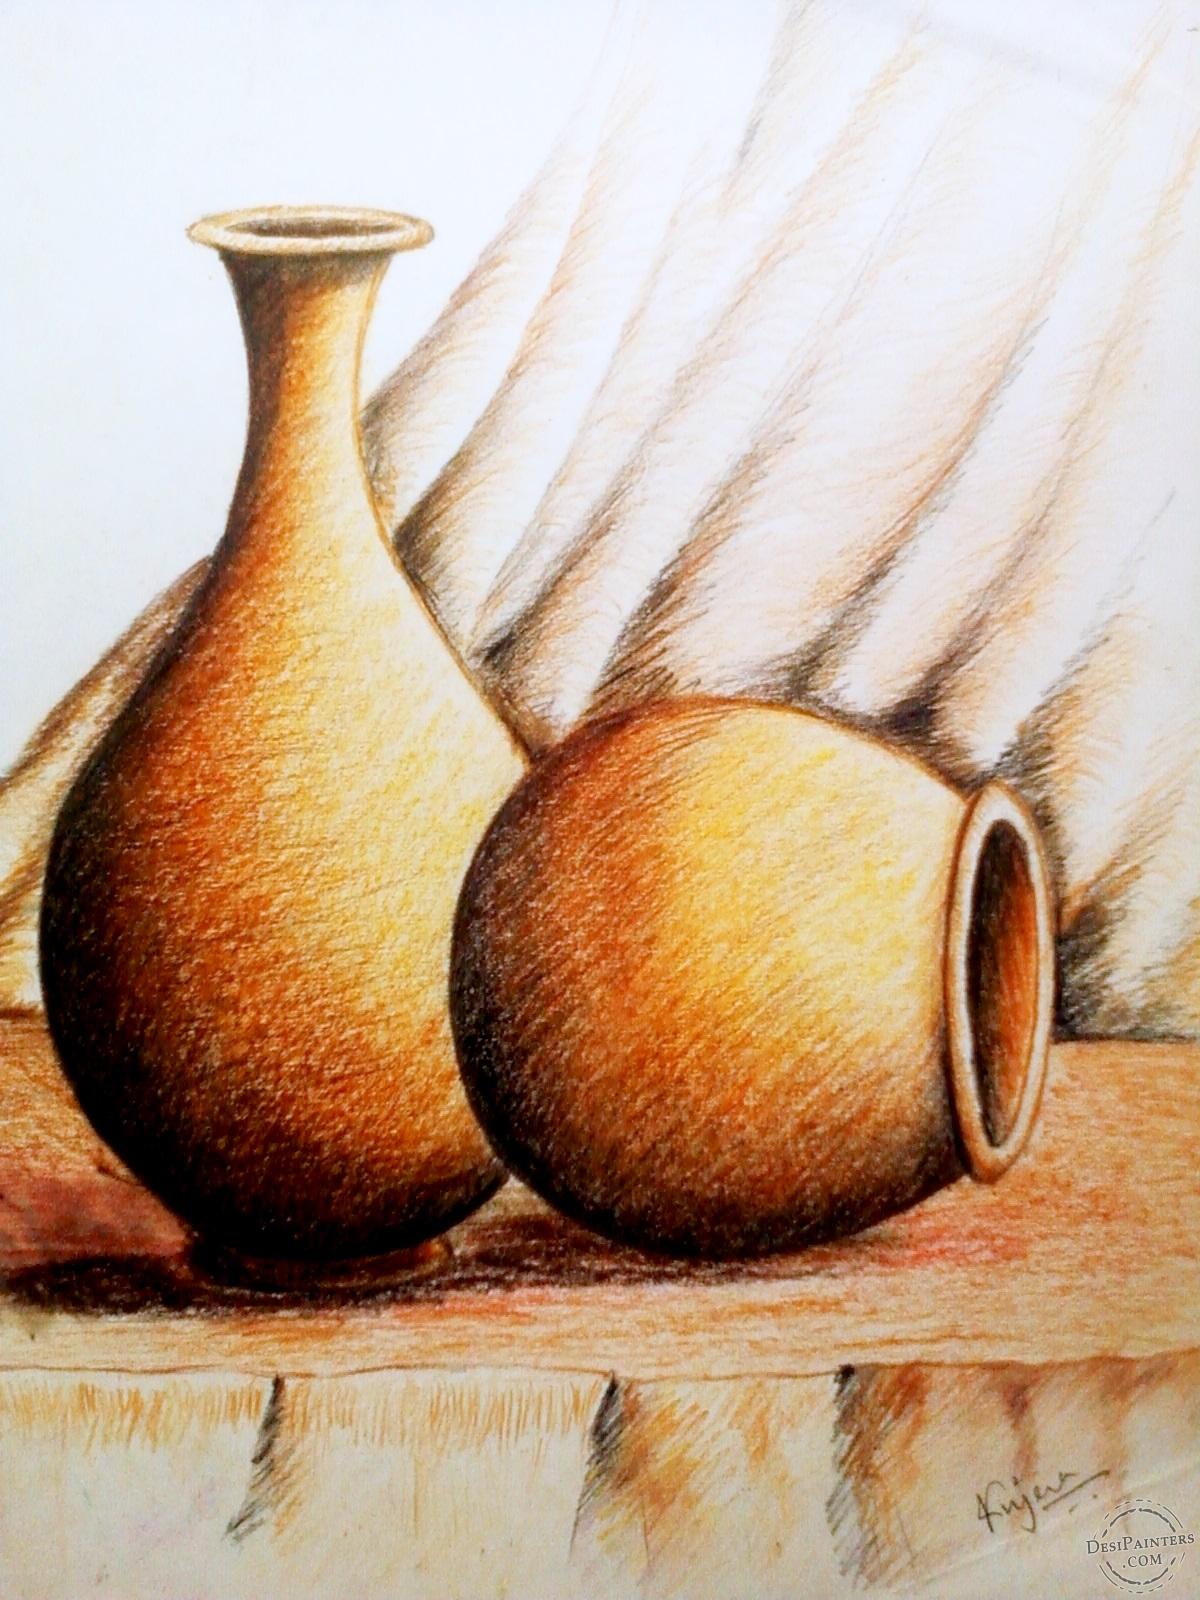 Drawn still life oil pastel The Life Sketch Jena Art)